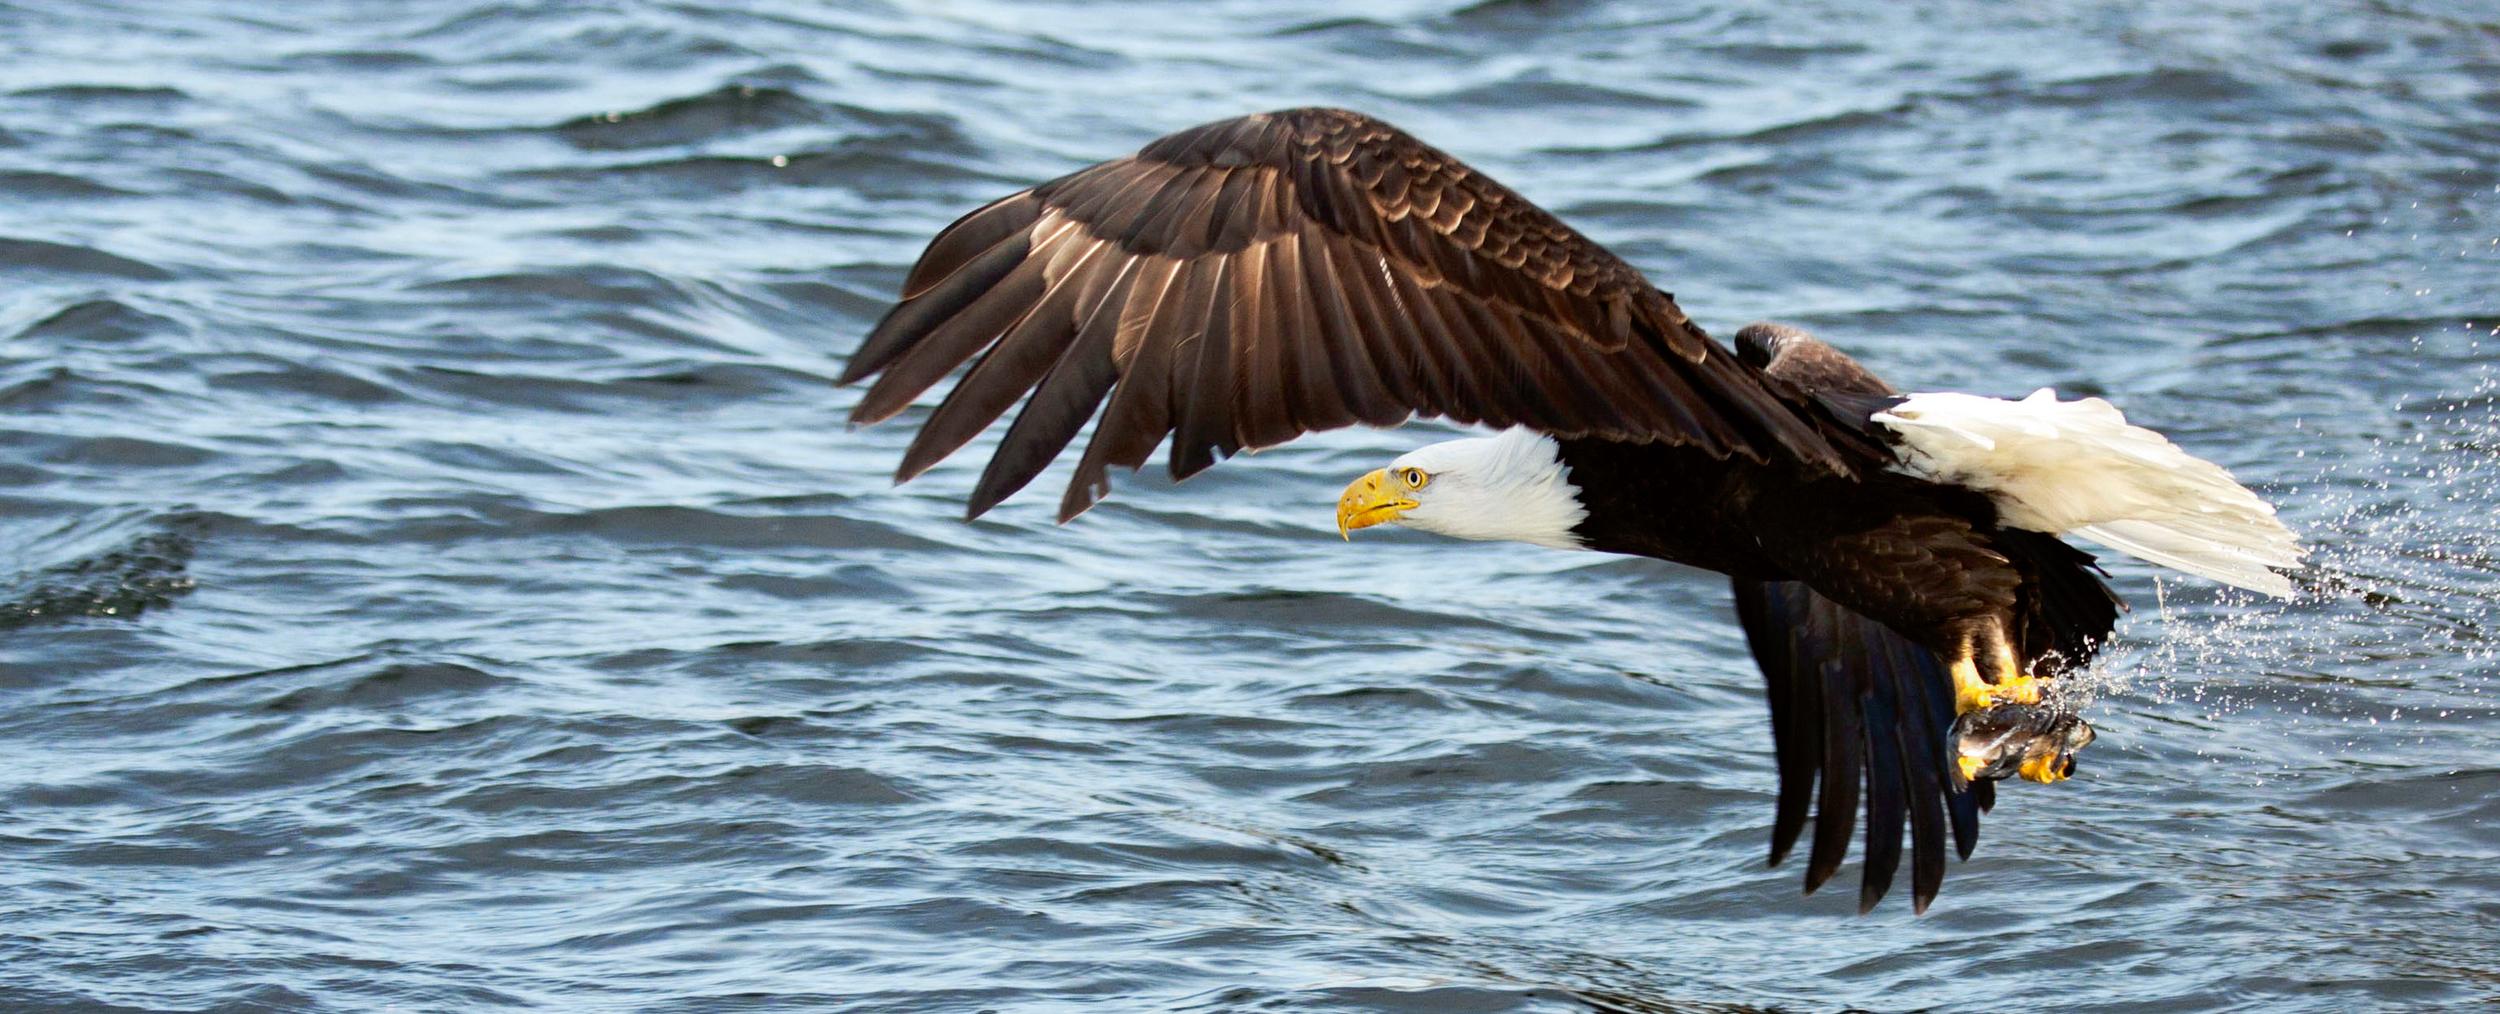 Rick Sammon's Birds013.jpg